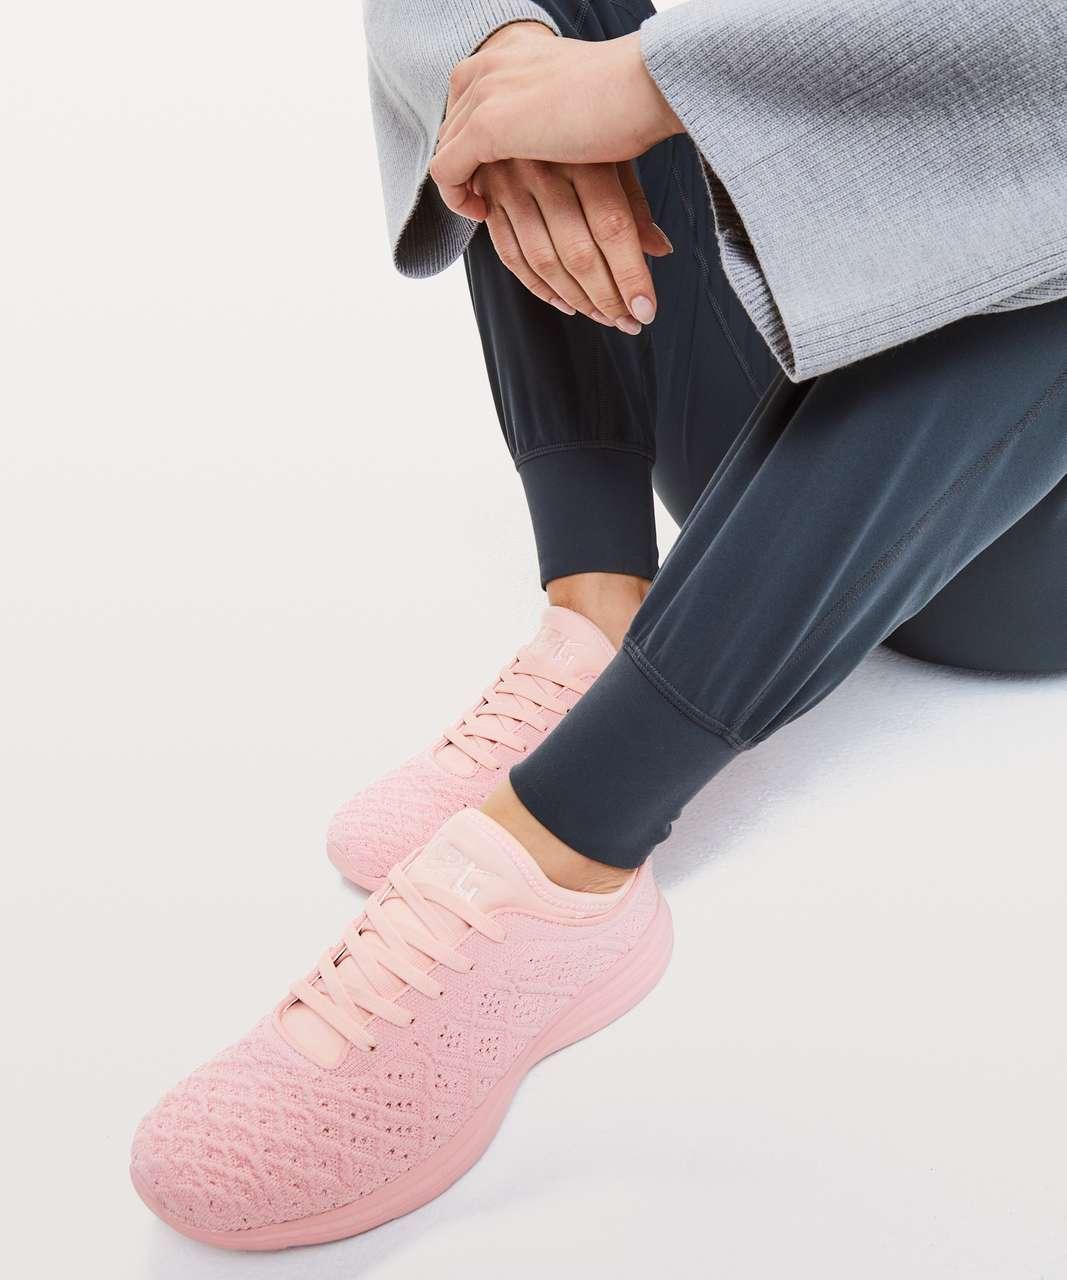 Lululemon Womens TechLoom Phantom Shoe - Faint Coral